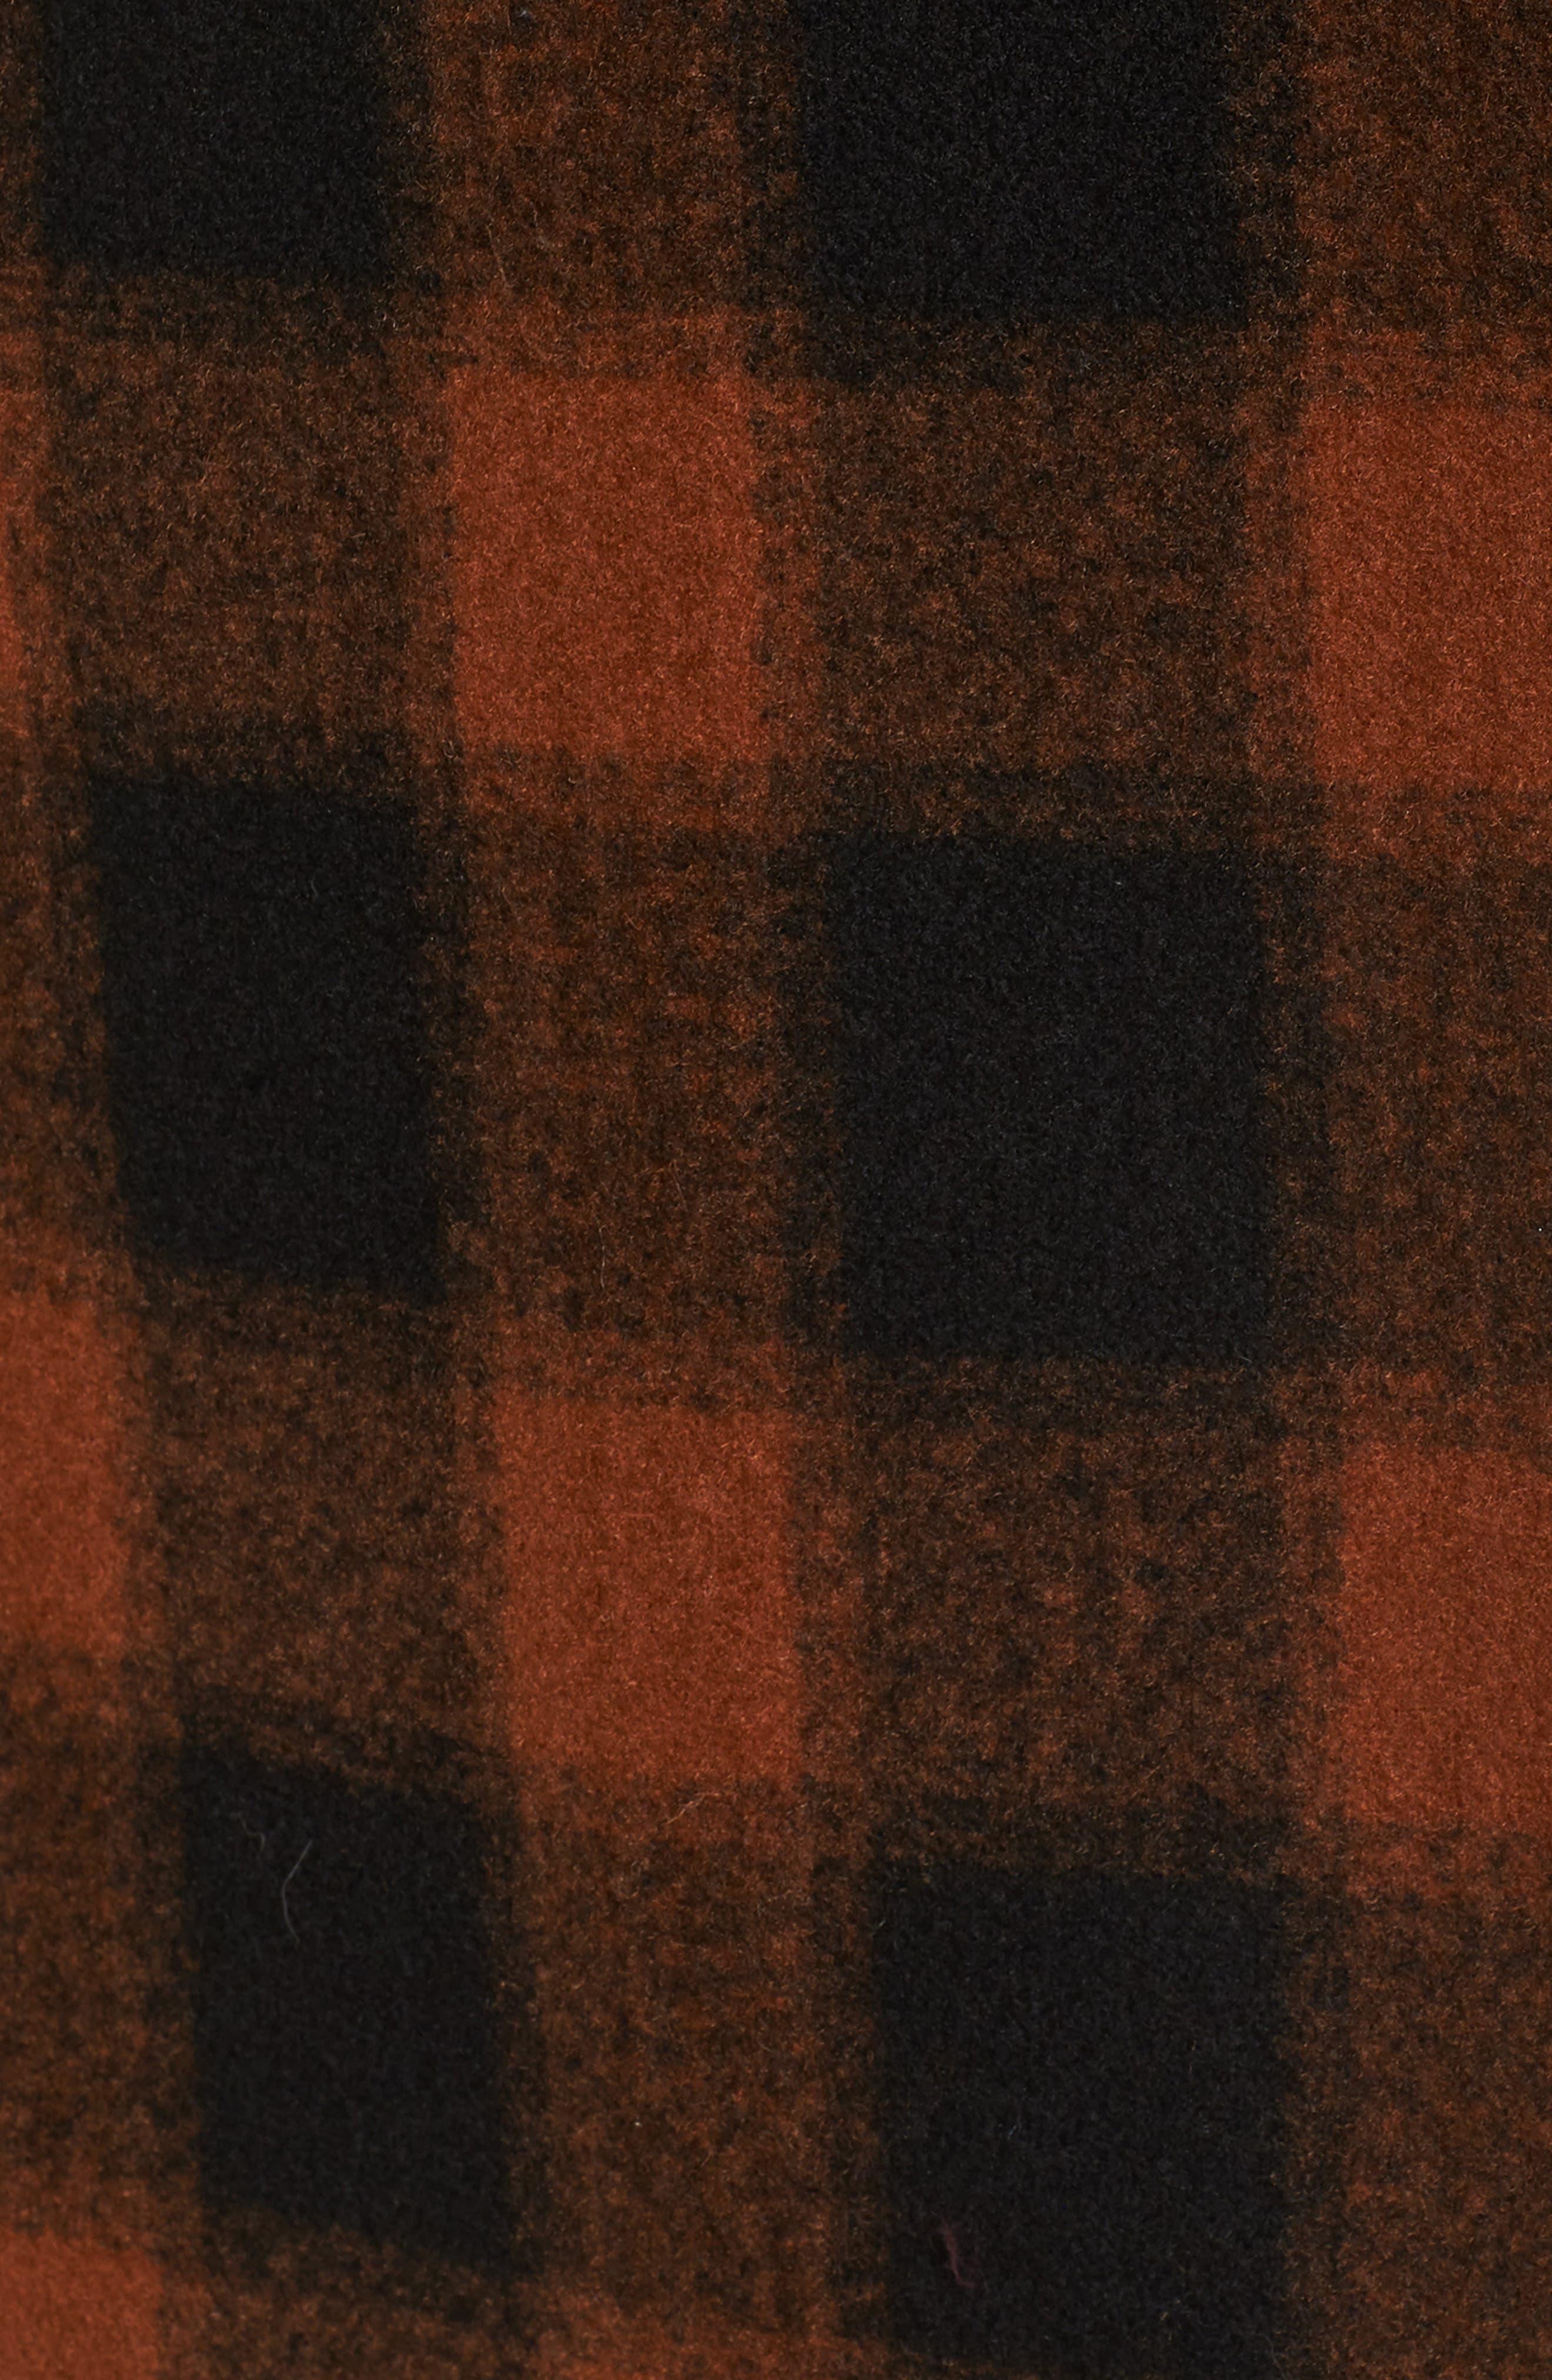 Oversize Boiled Wool Coat,                             Alternate thumbnail 6, color,                             PLAID